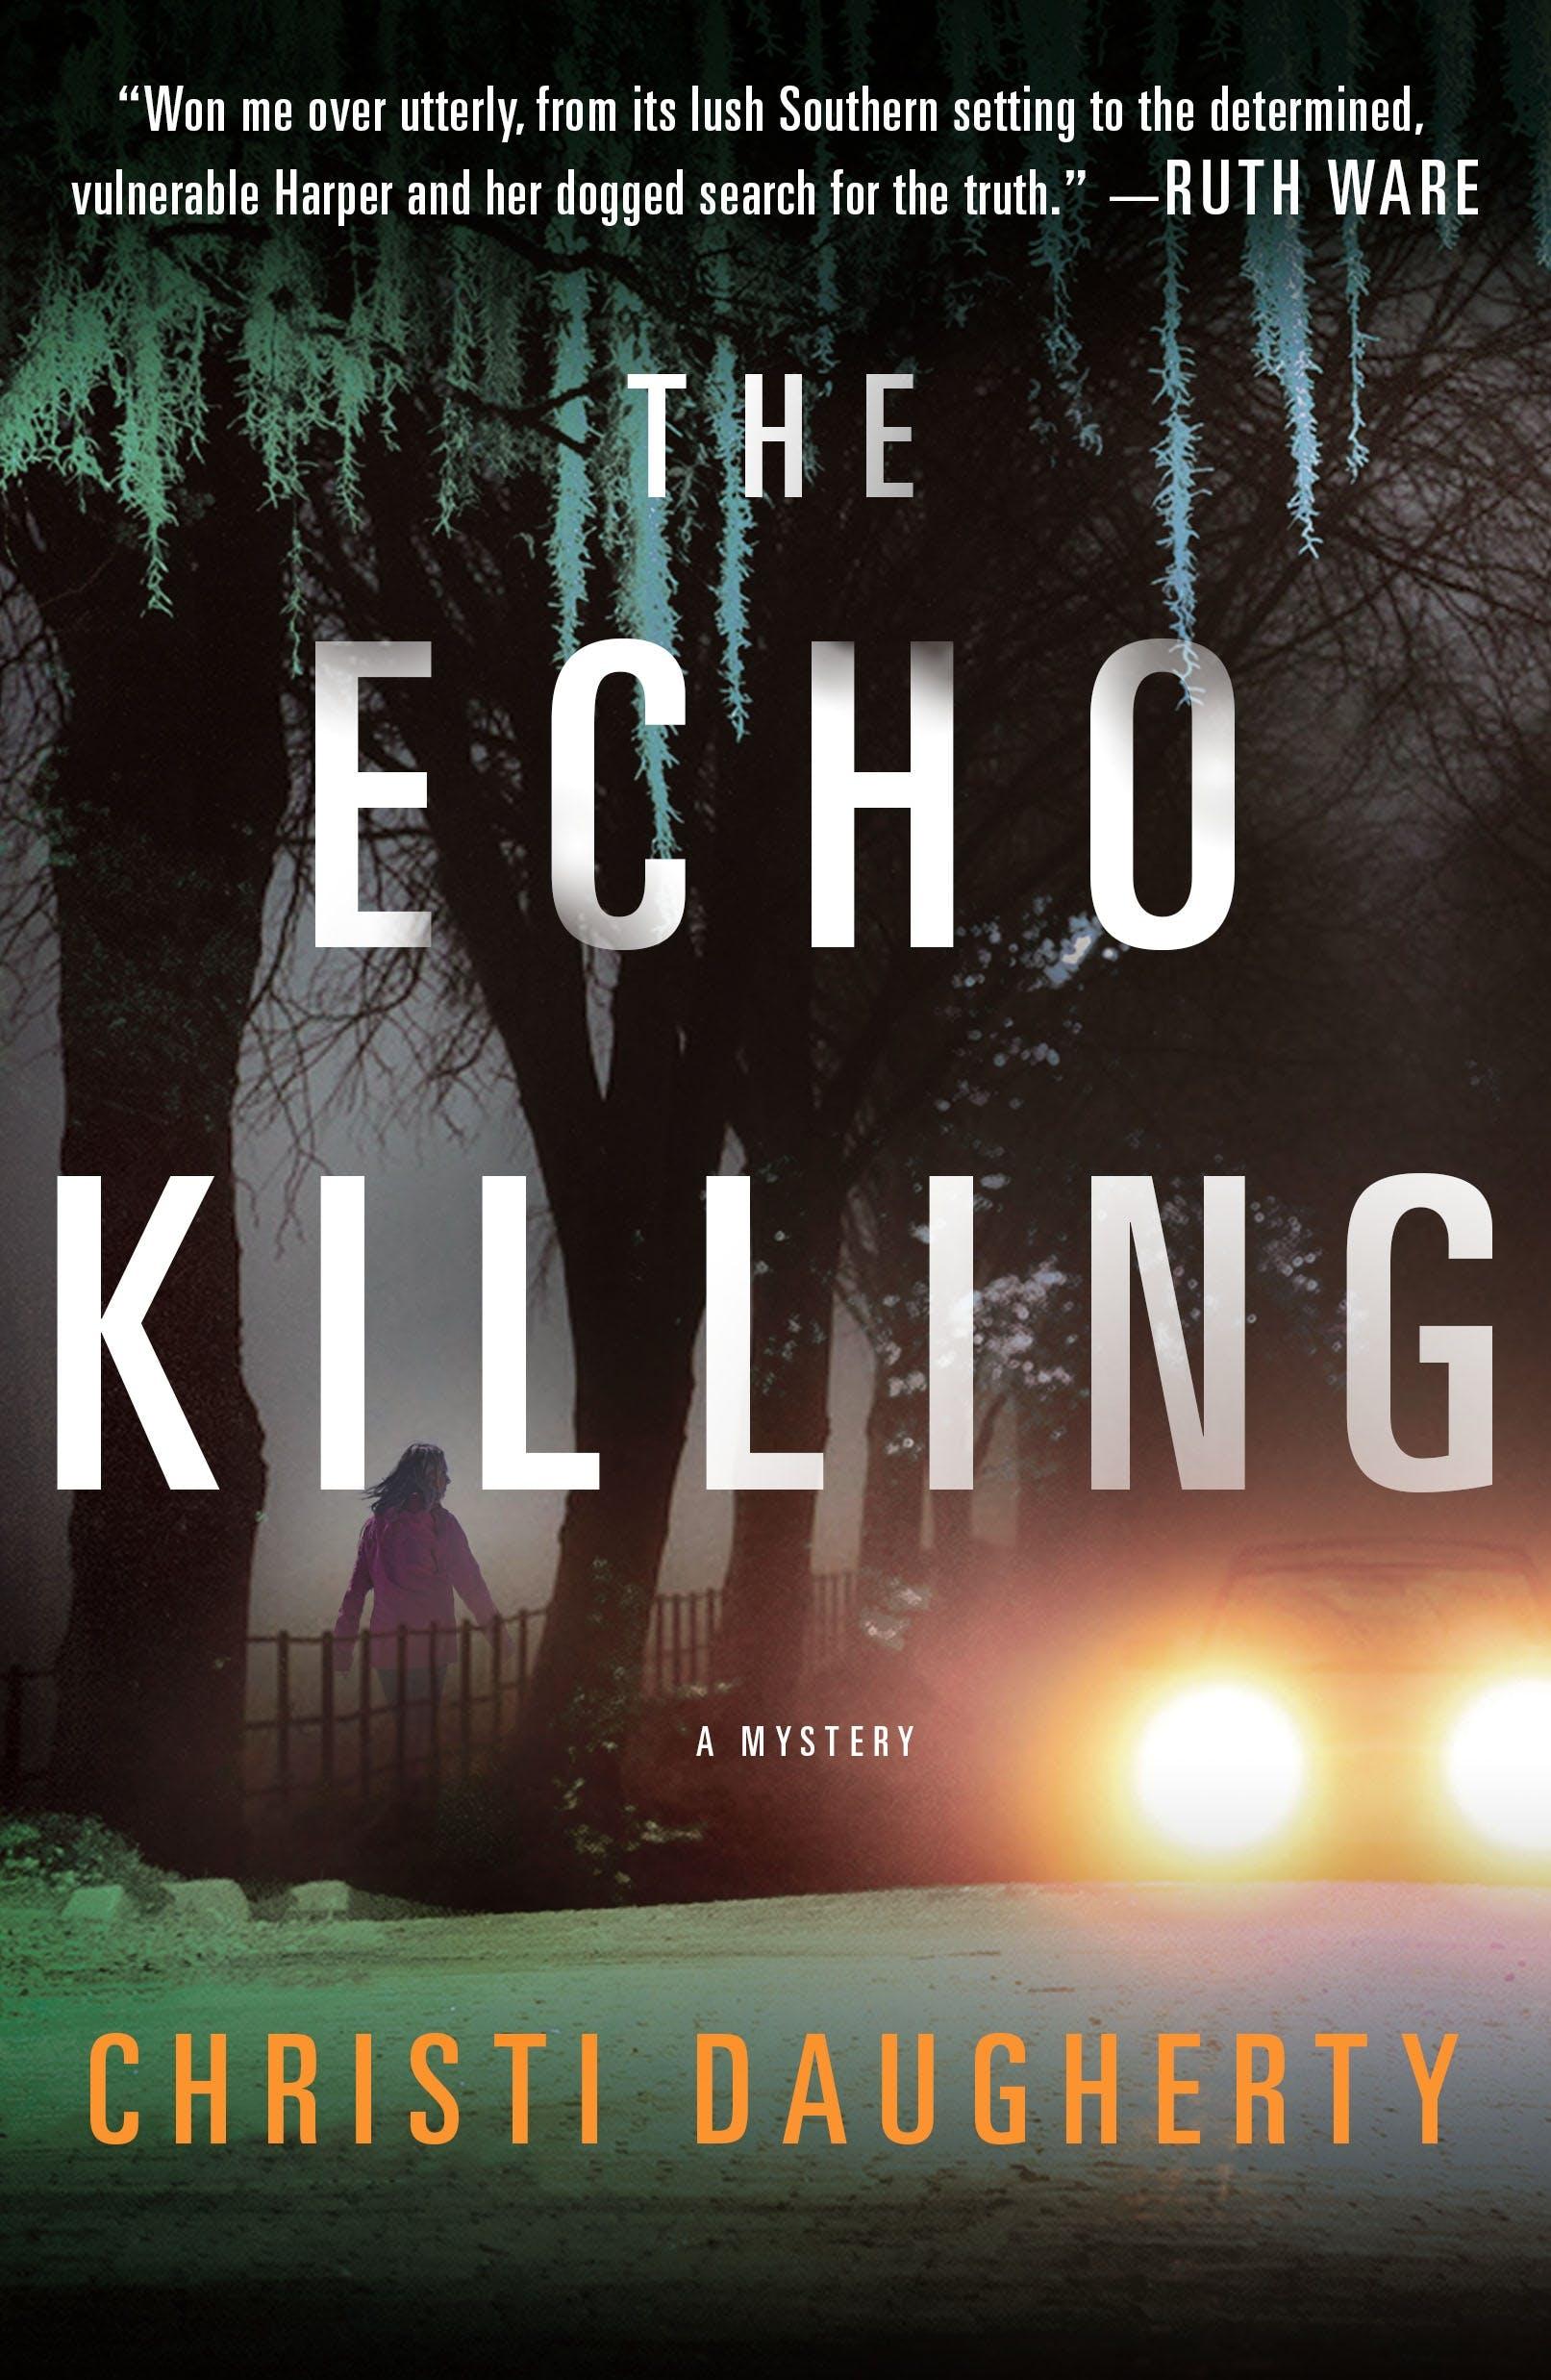 Image of The Echo Killing